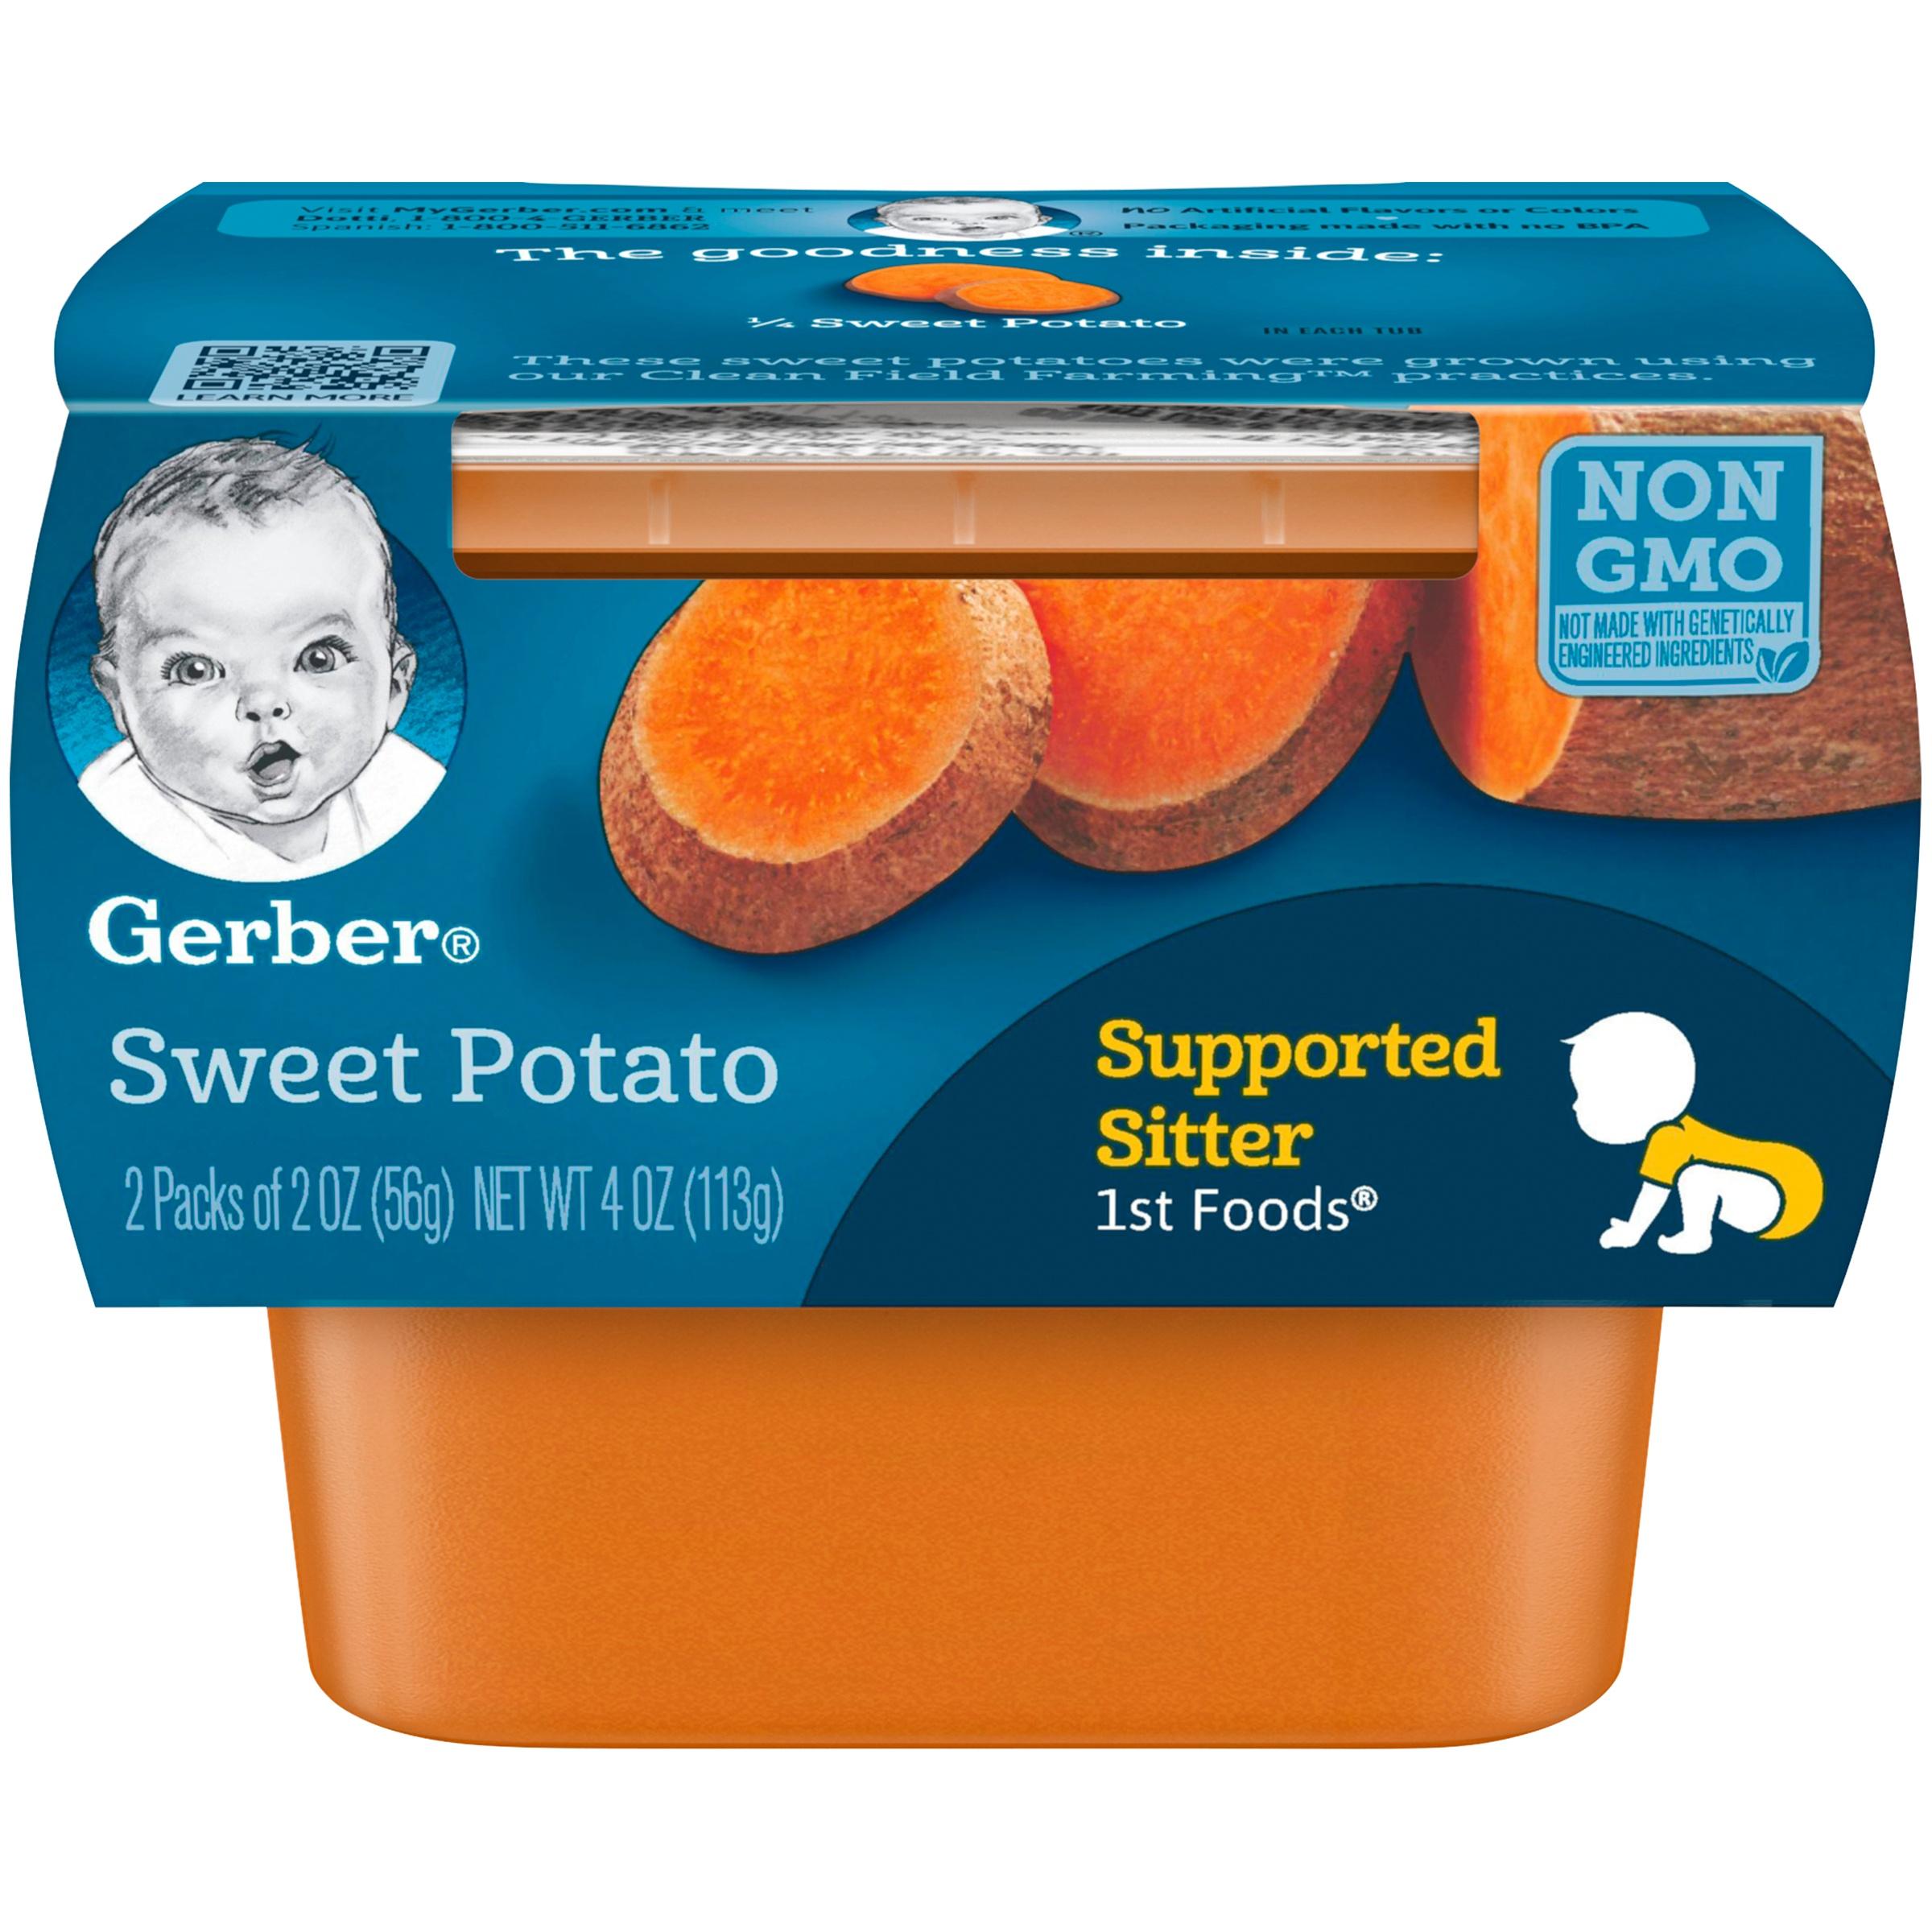 (8 Pack) Gerber 1st Foods Sweet Potato Baby Food, 4 oz. Sleeve